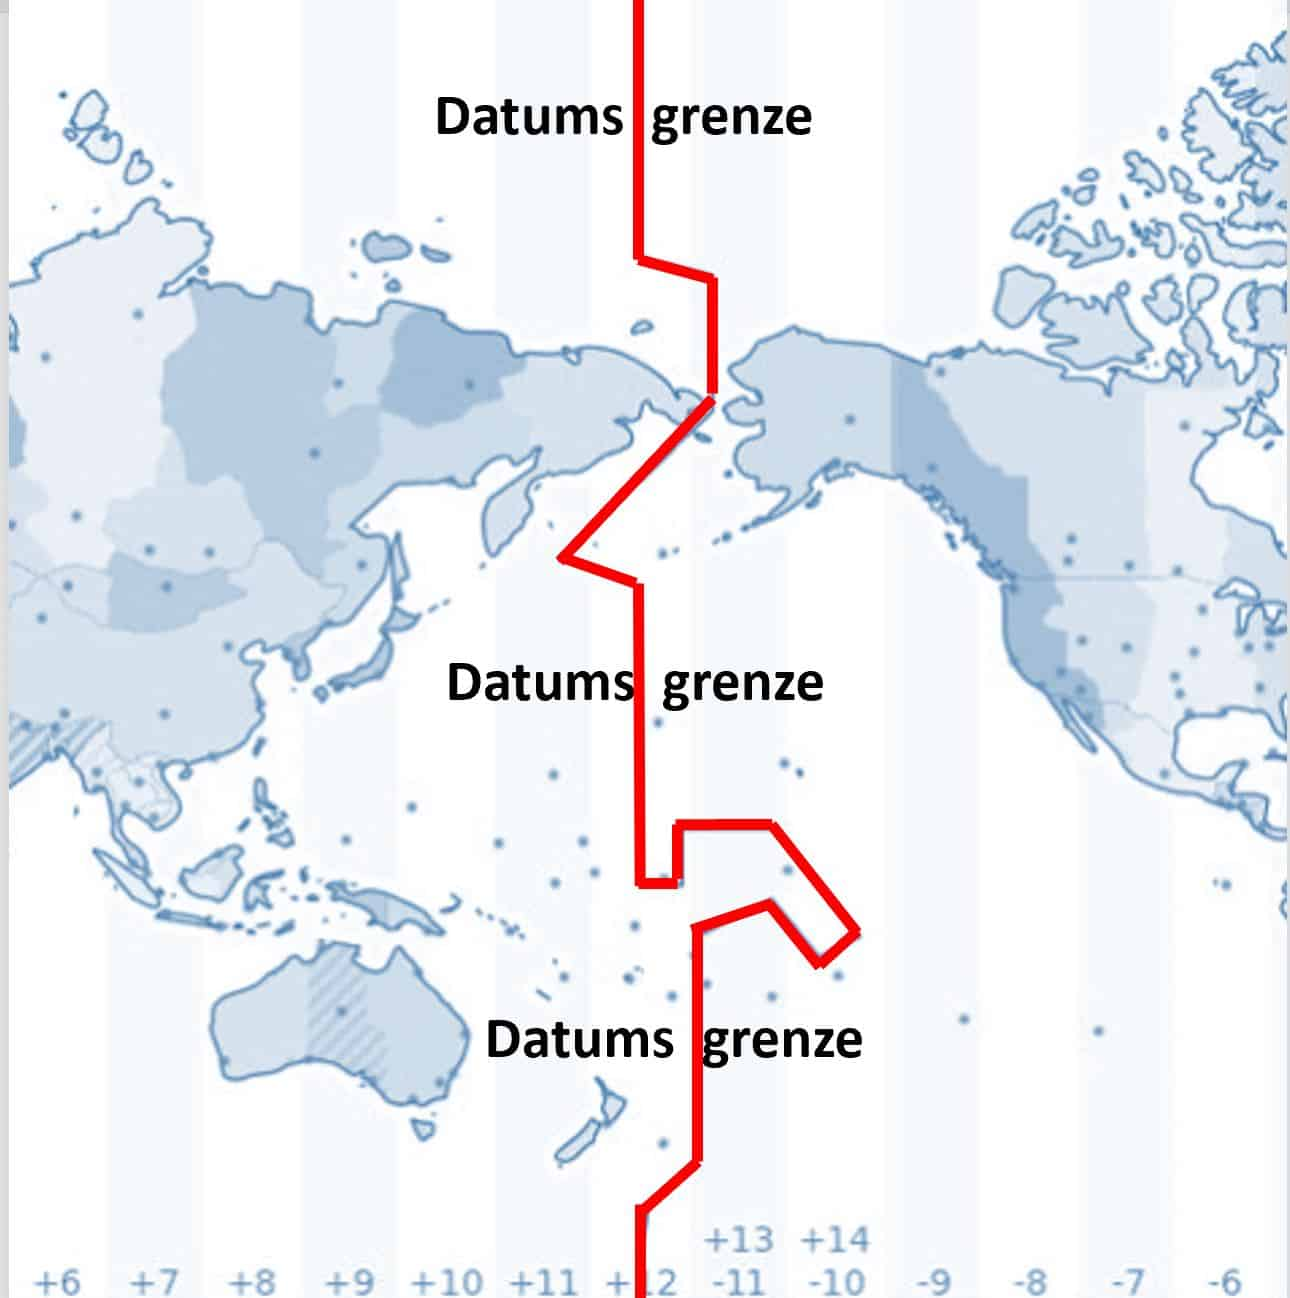 Datumsgrenze Weltkarte